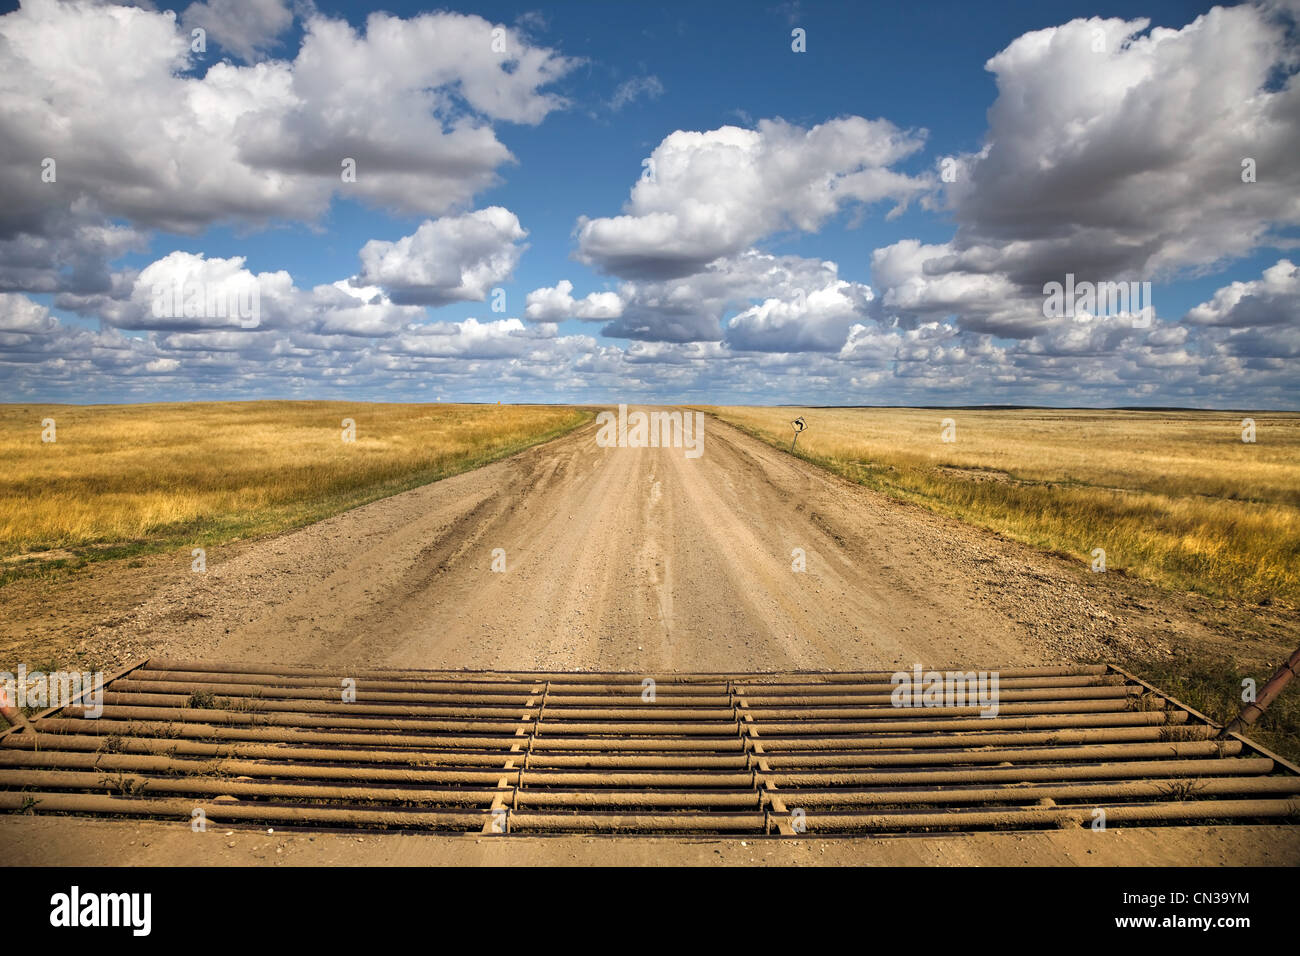 Texas gate, rural road - Stock Image